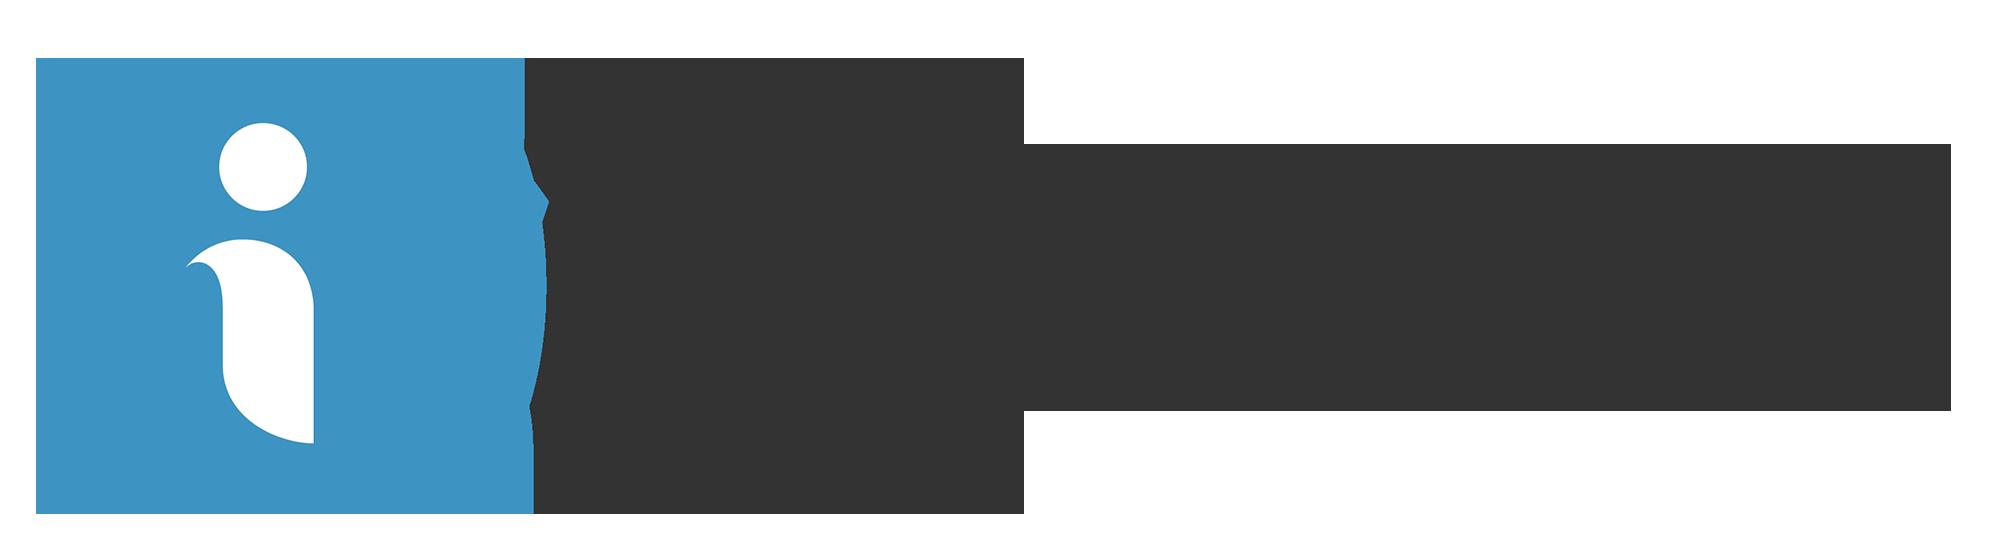 Remote OR DC Data Integration Engineer Interfolio 1616534866211